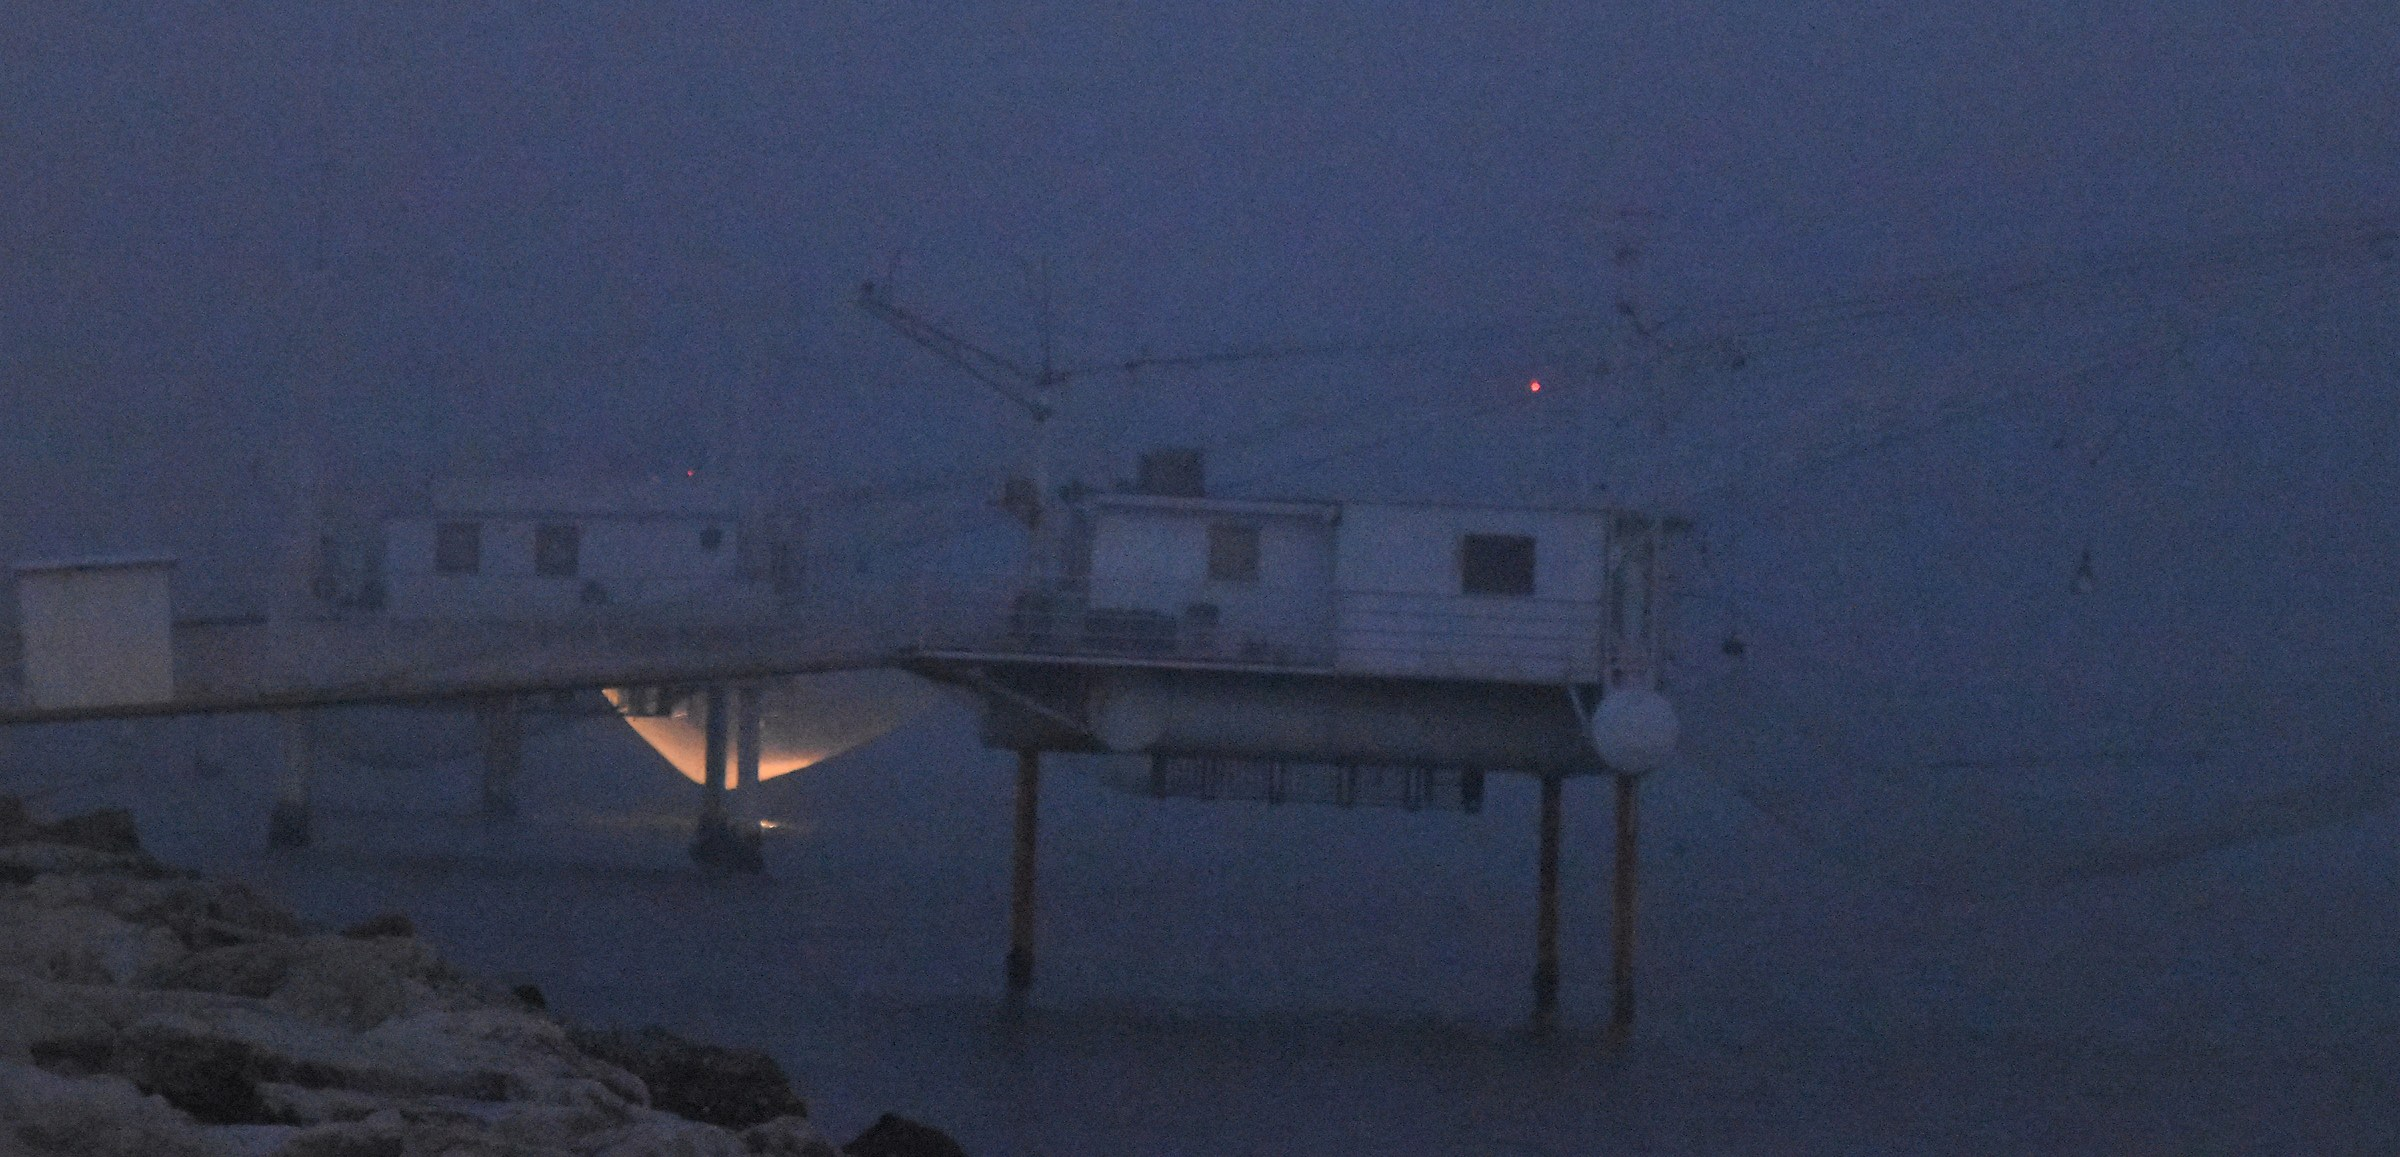 In the fog.. In the net I caught the light...